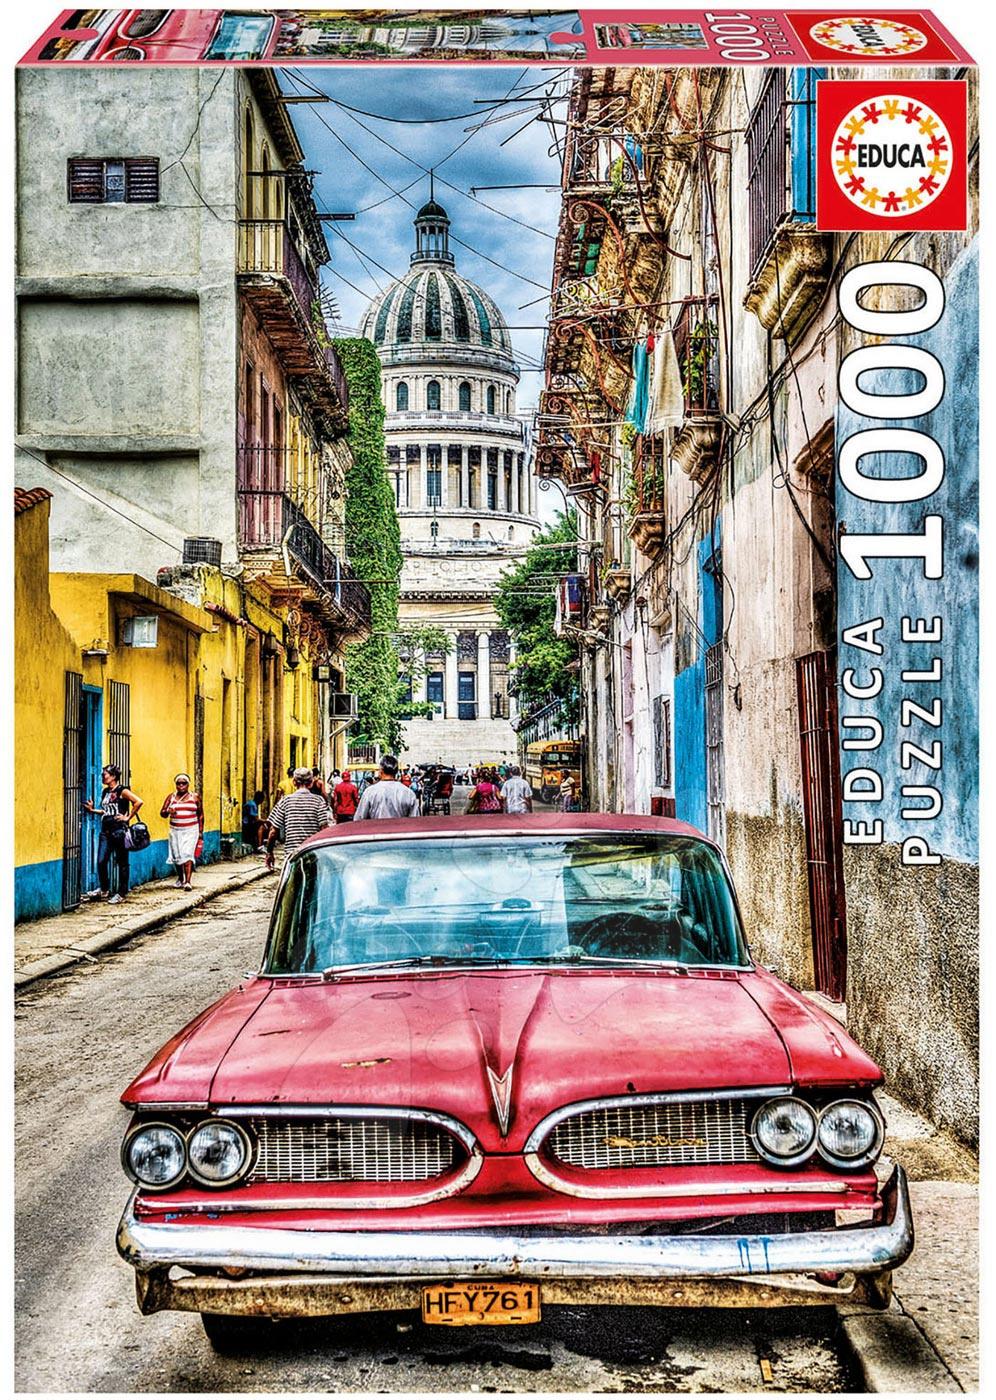 Puzzle Genuine Vintage car in old Havana Educa 1000 dílů od 12 let